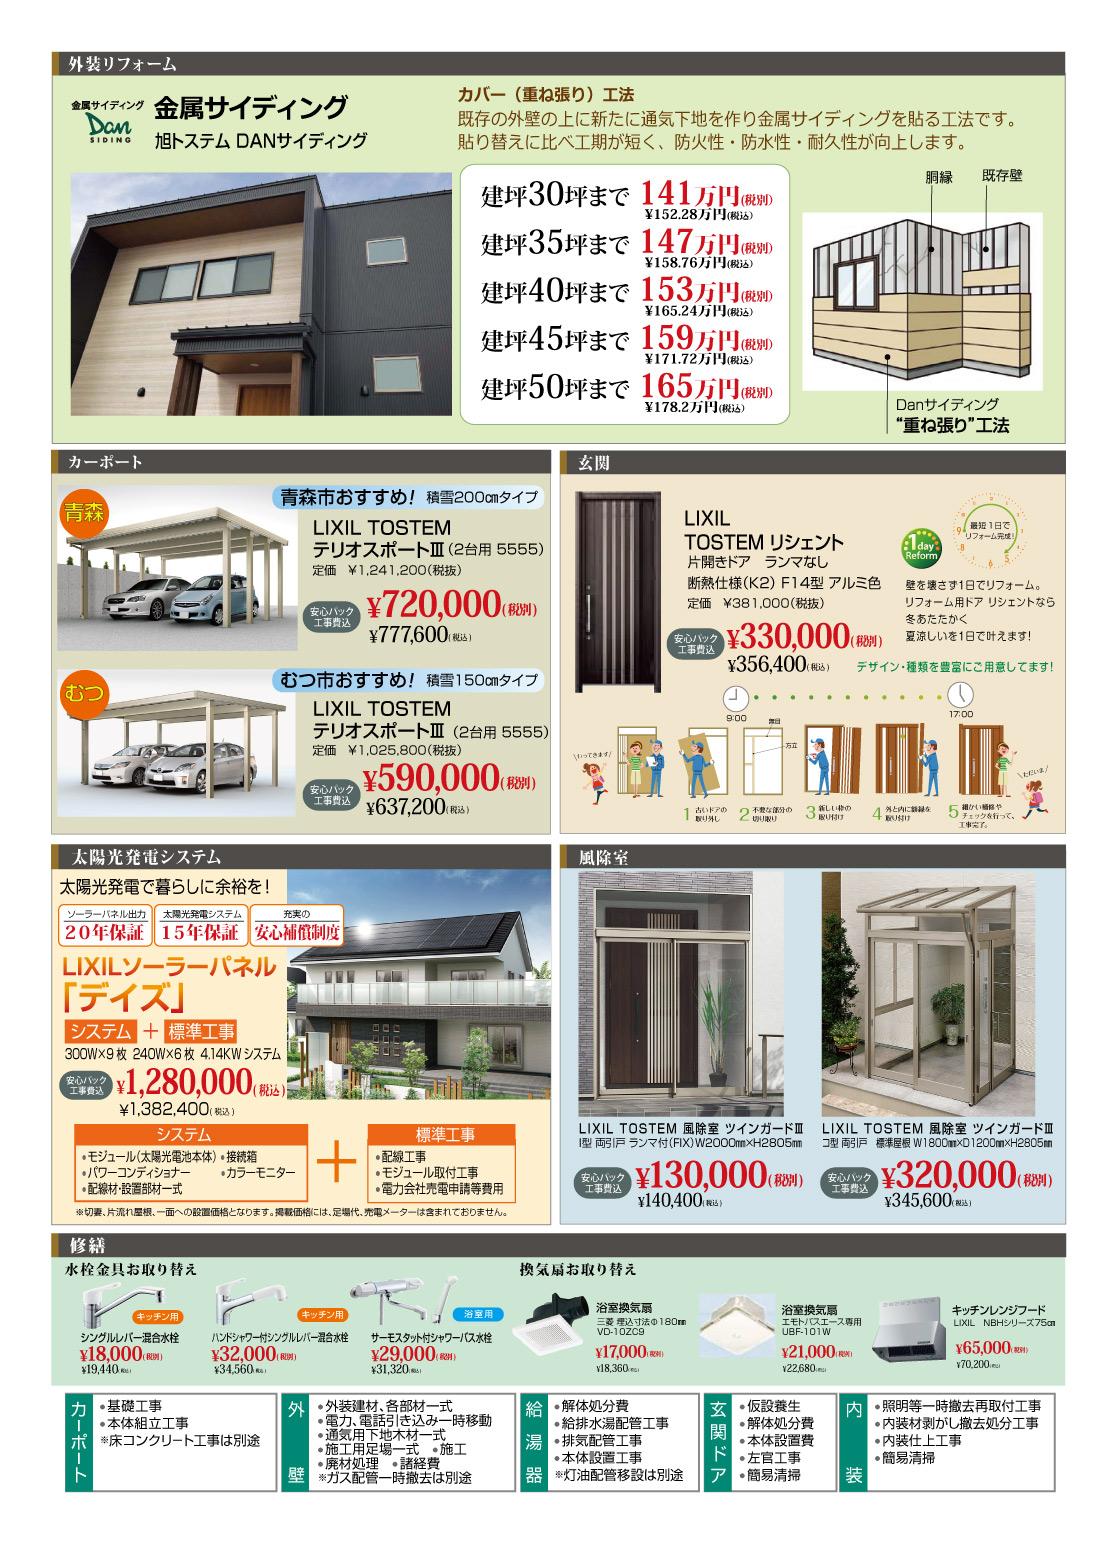 https://lixil-reformshop.jp/shop/SC00021006/0310chirashi_B3_nakamigi.jpg